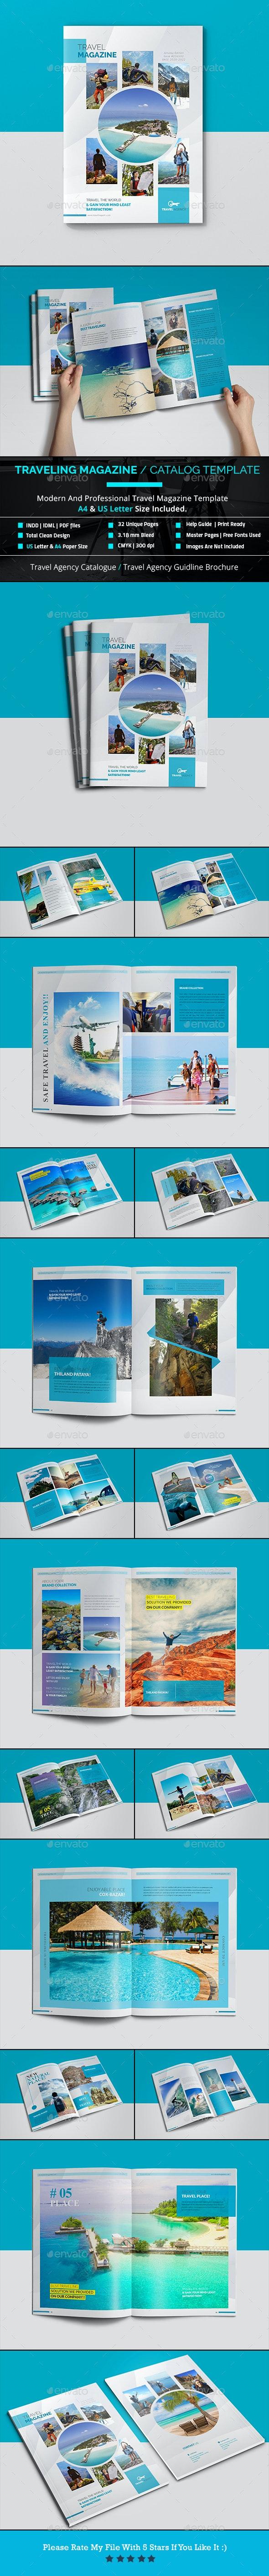 Traveling Magazine / Catalog Template - Magazines Print Templates